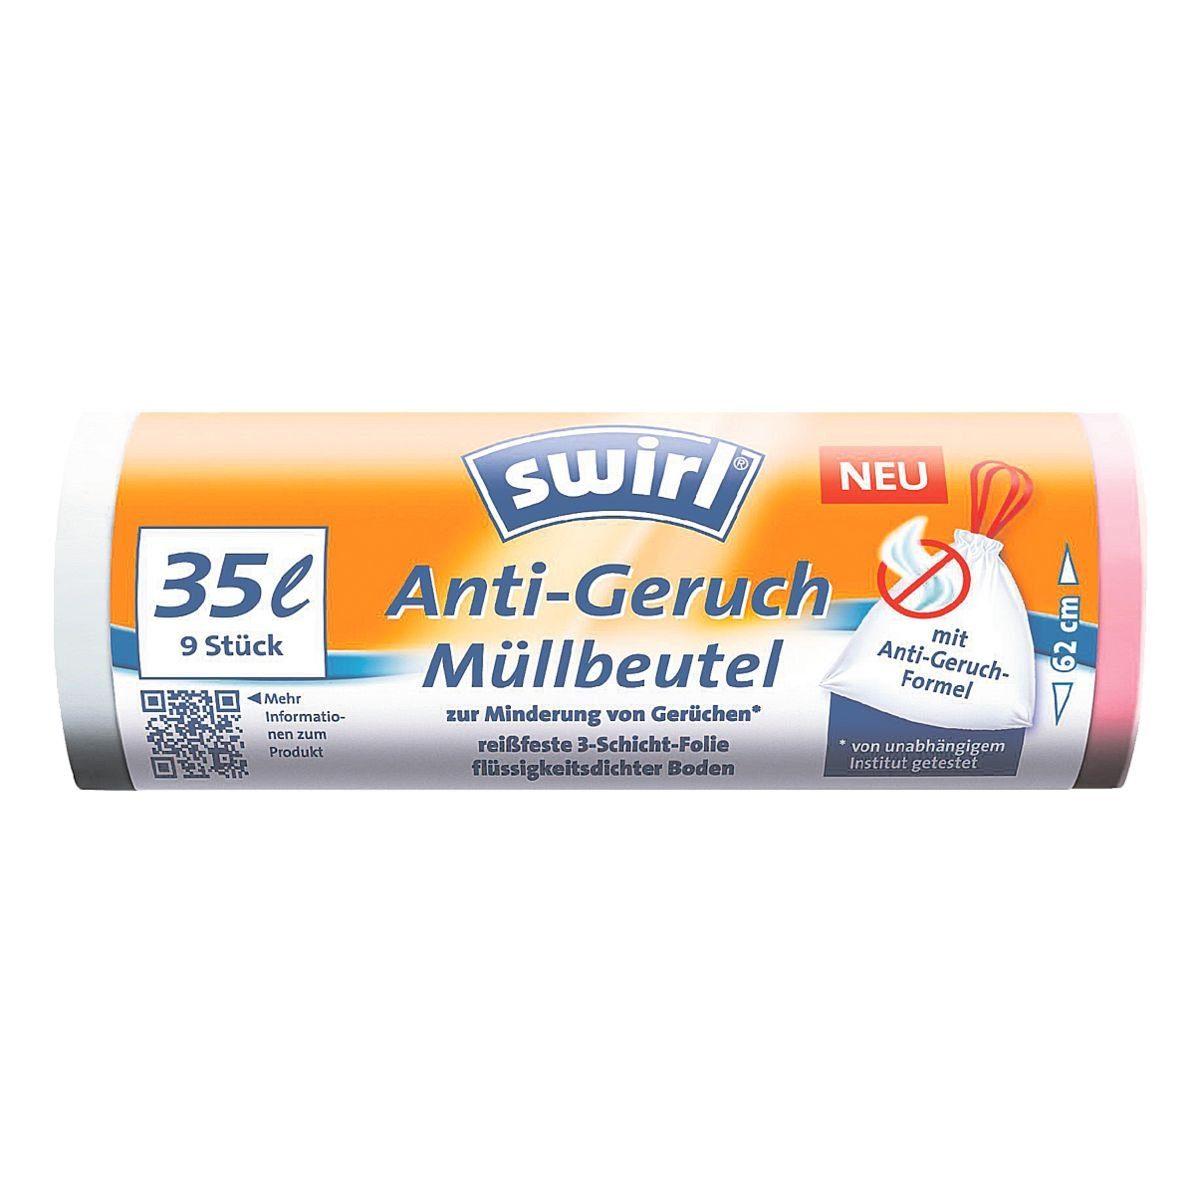 Swirl Anti-Geruch Müllbeutel